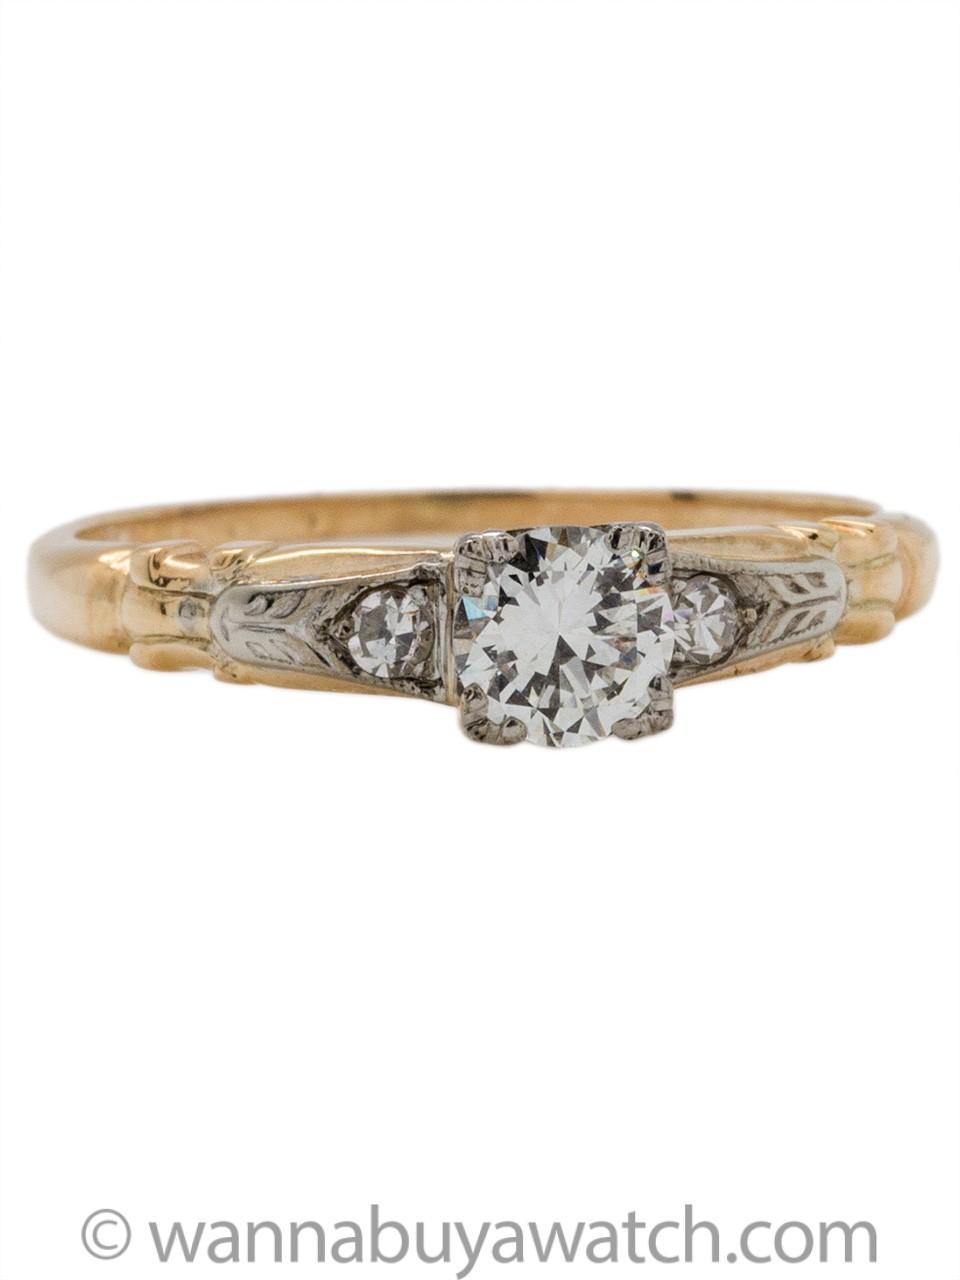 Vintage Diamond Engagement Ring 14K 0.30ct J-VS1 circa 1940s